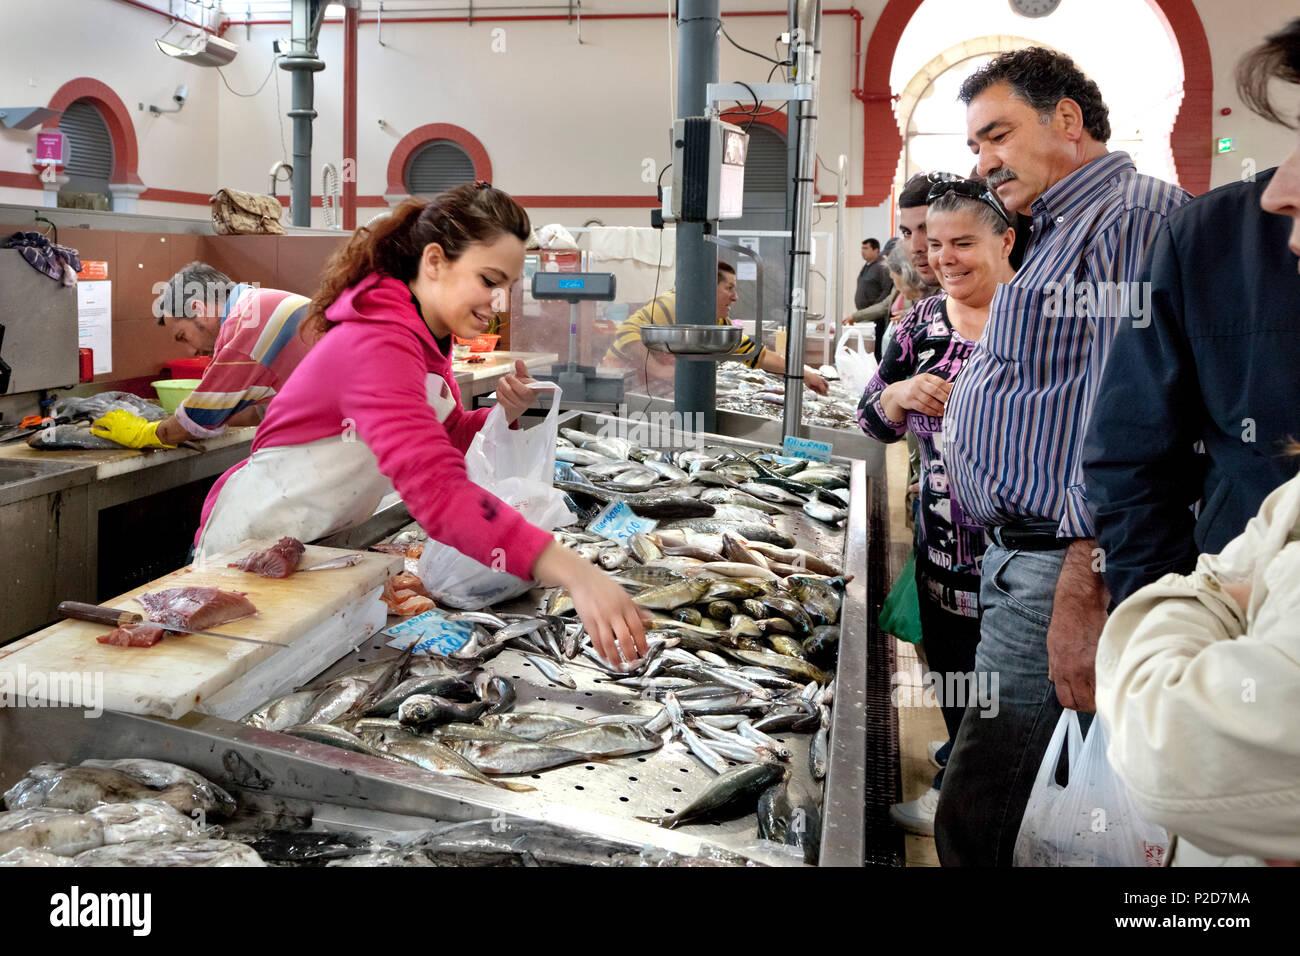 Fischmarkt in Halle, Loulé, Algarve, Portugal Stockbild